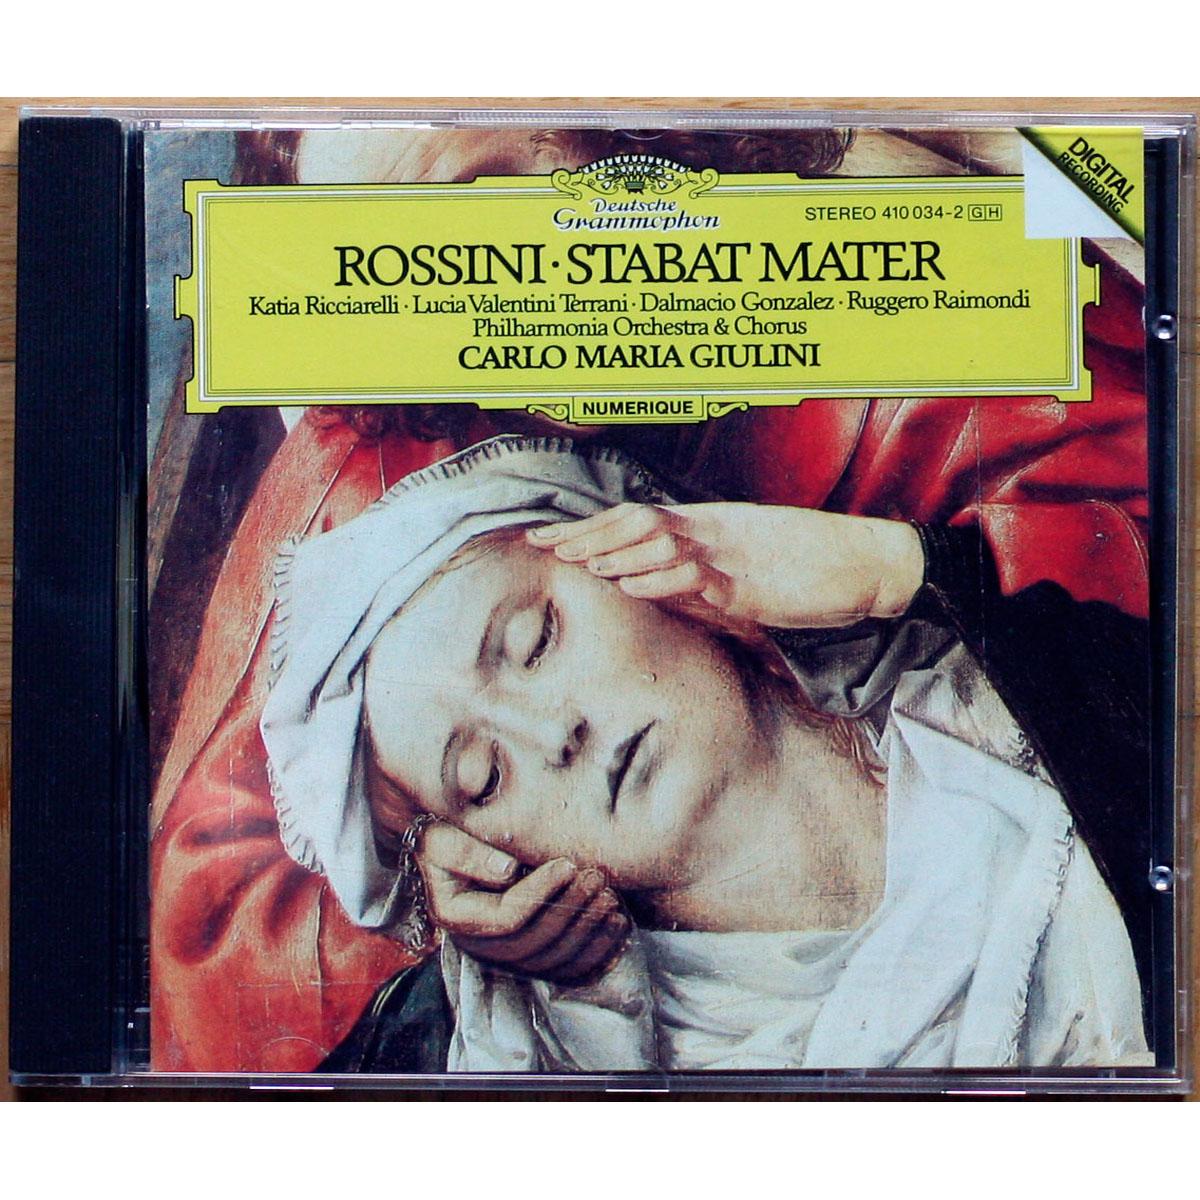 Rossini Stabat Mater Giulini